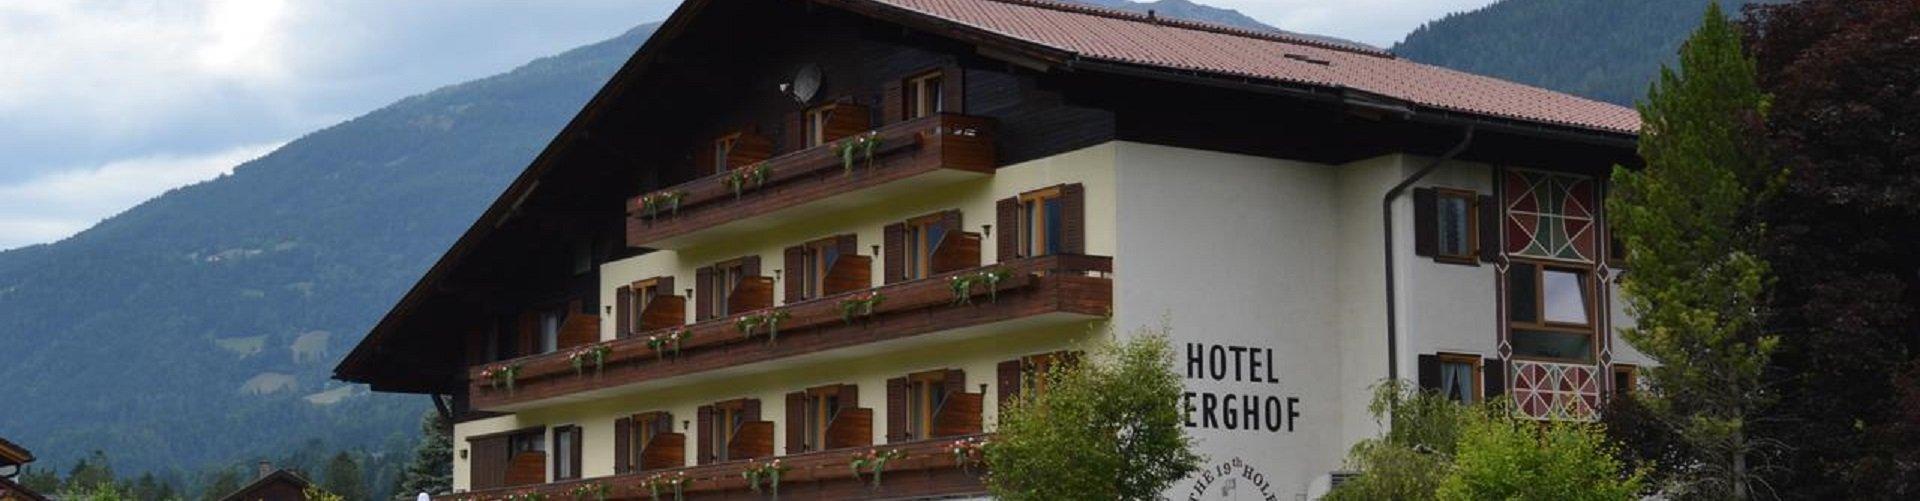 Bannerfoto 3 Hotel Berghof